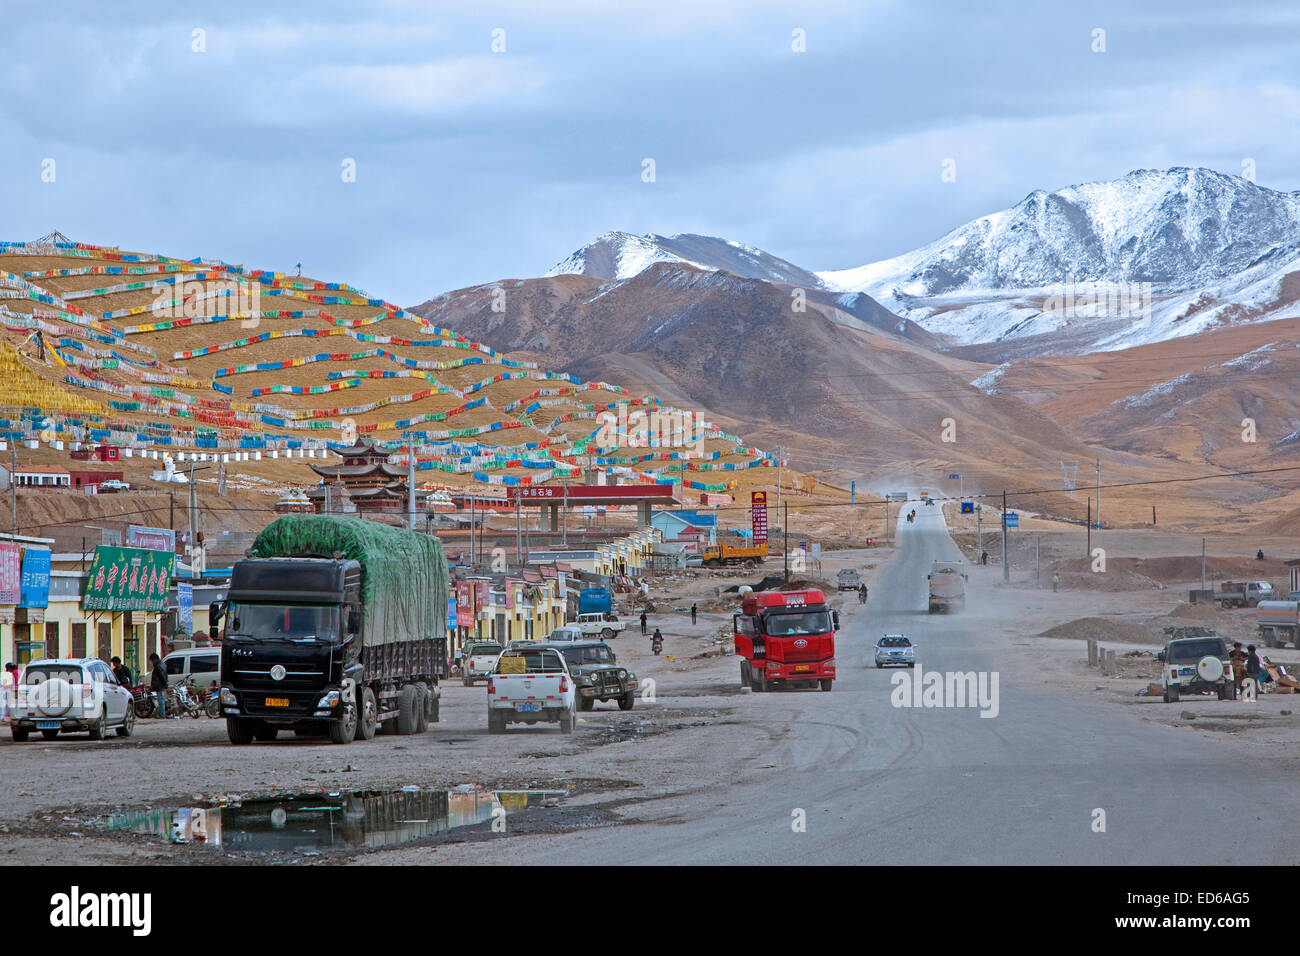 Tibetan prayer flags at settlement along a high road through the Himalayas between Xining and Yushu, Qinghai Province, - Stock Image